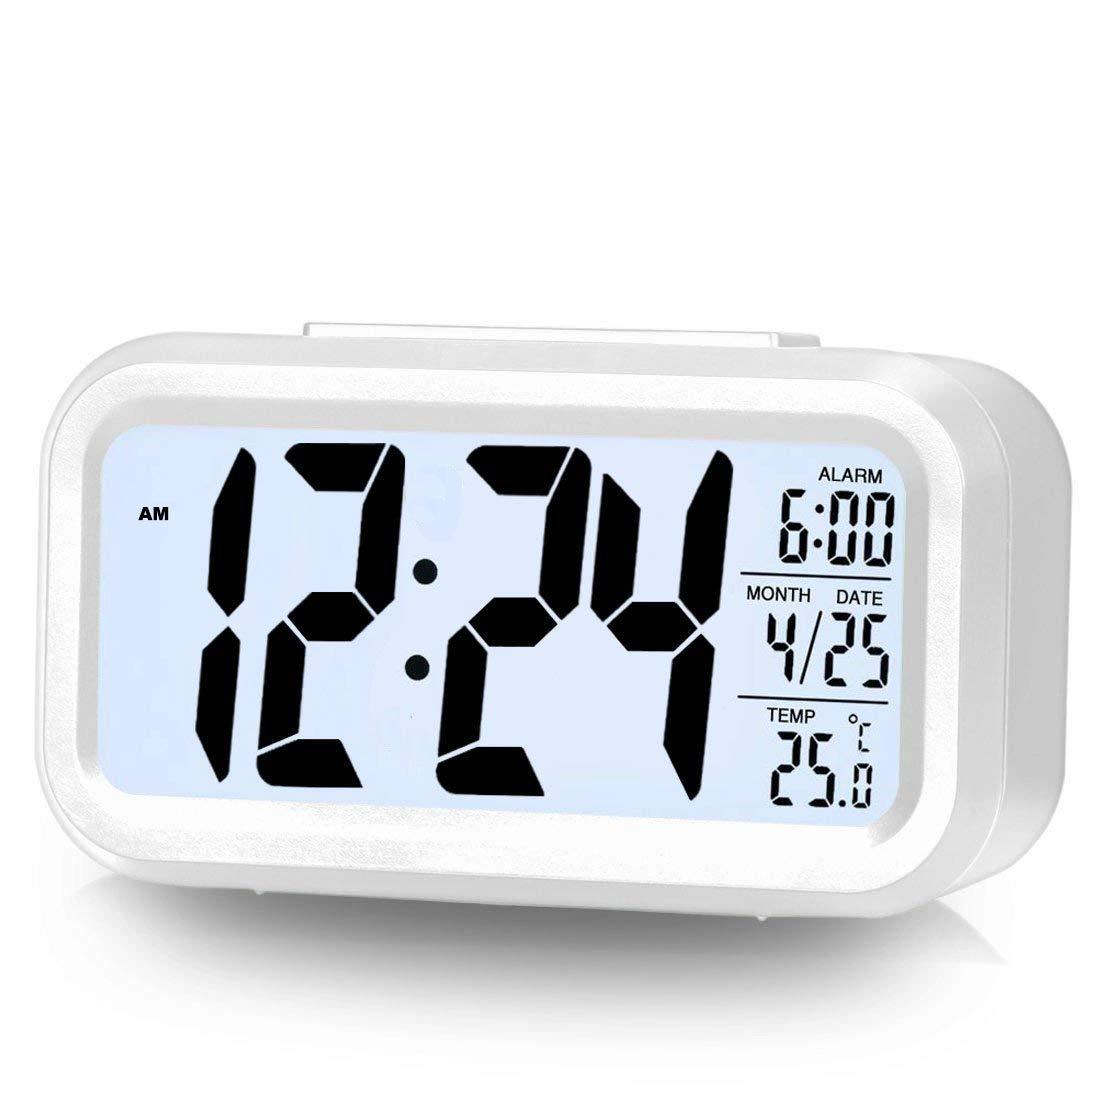 Eno Digita Alarm Clock Large LCD Display Temperature Date Snooze Night Light Alarm Clock